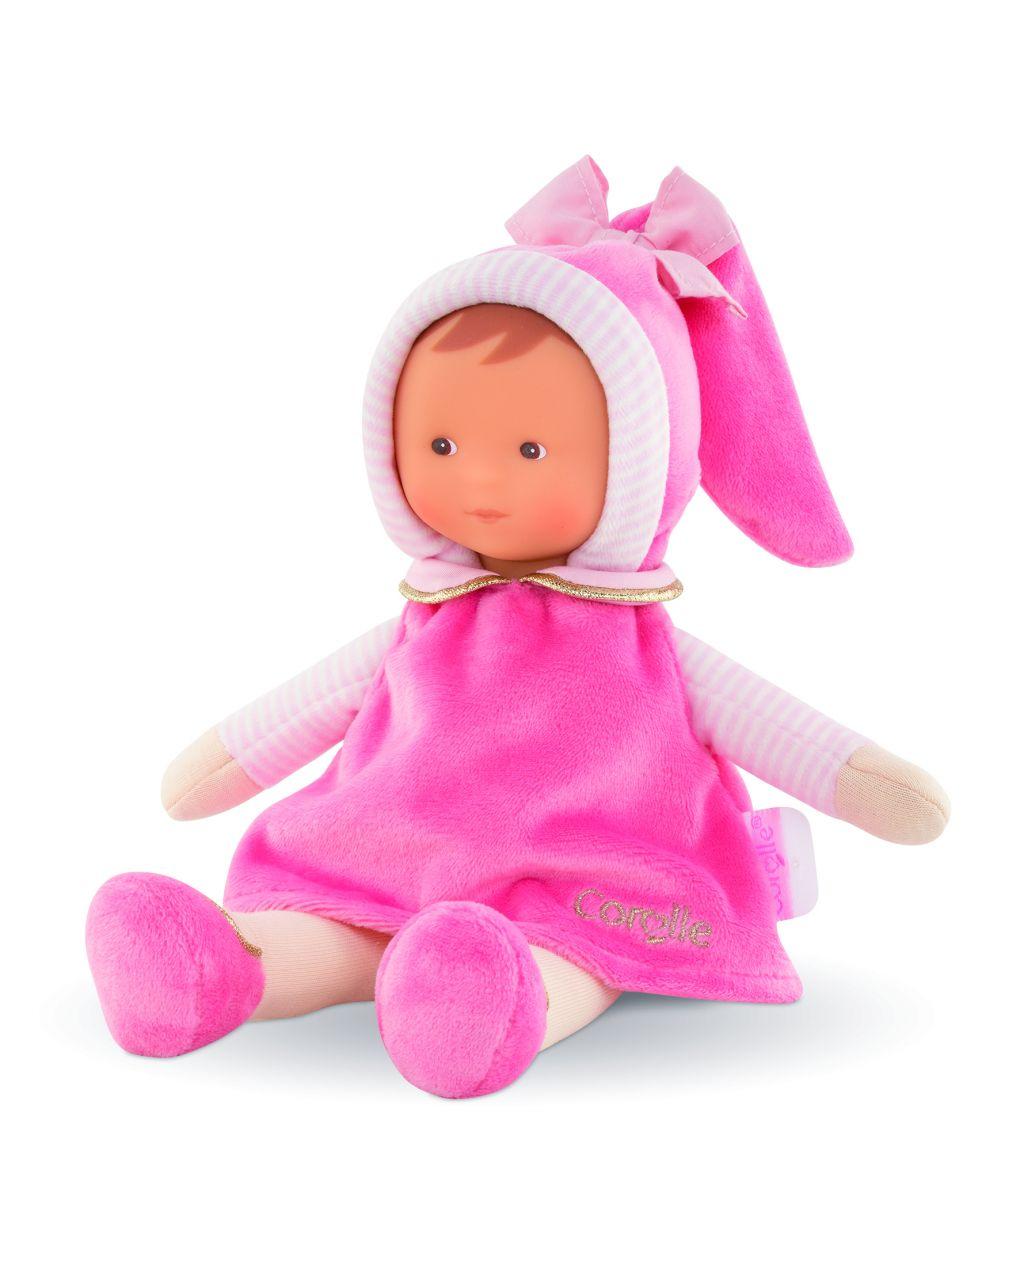 Corolle - miss-pink - sweet dreams - Corolle